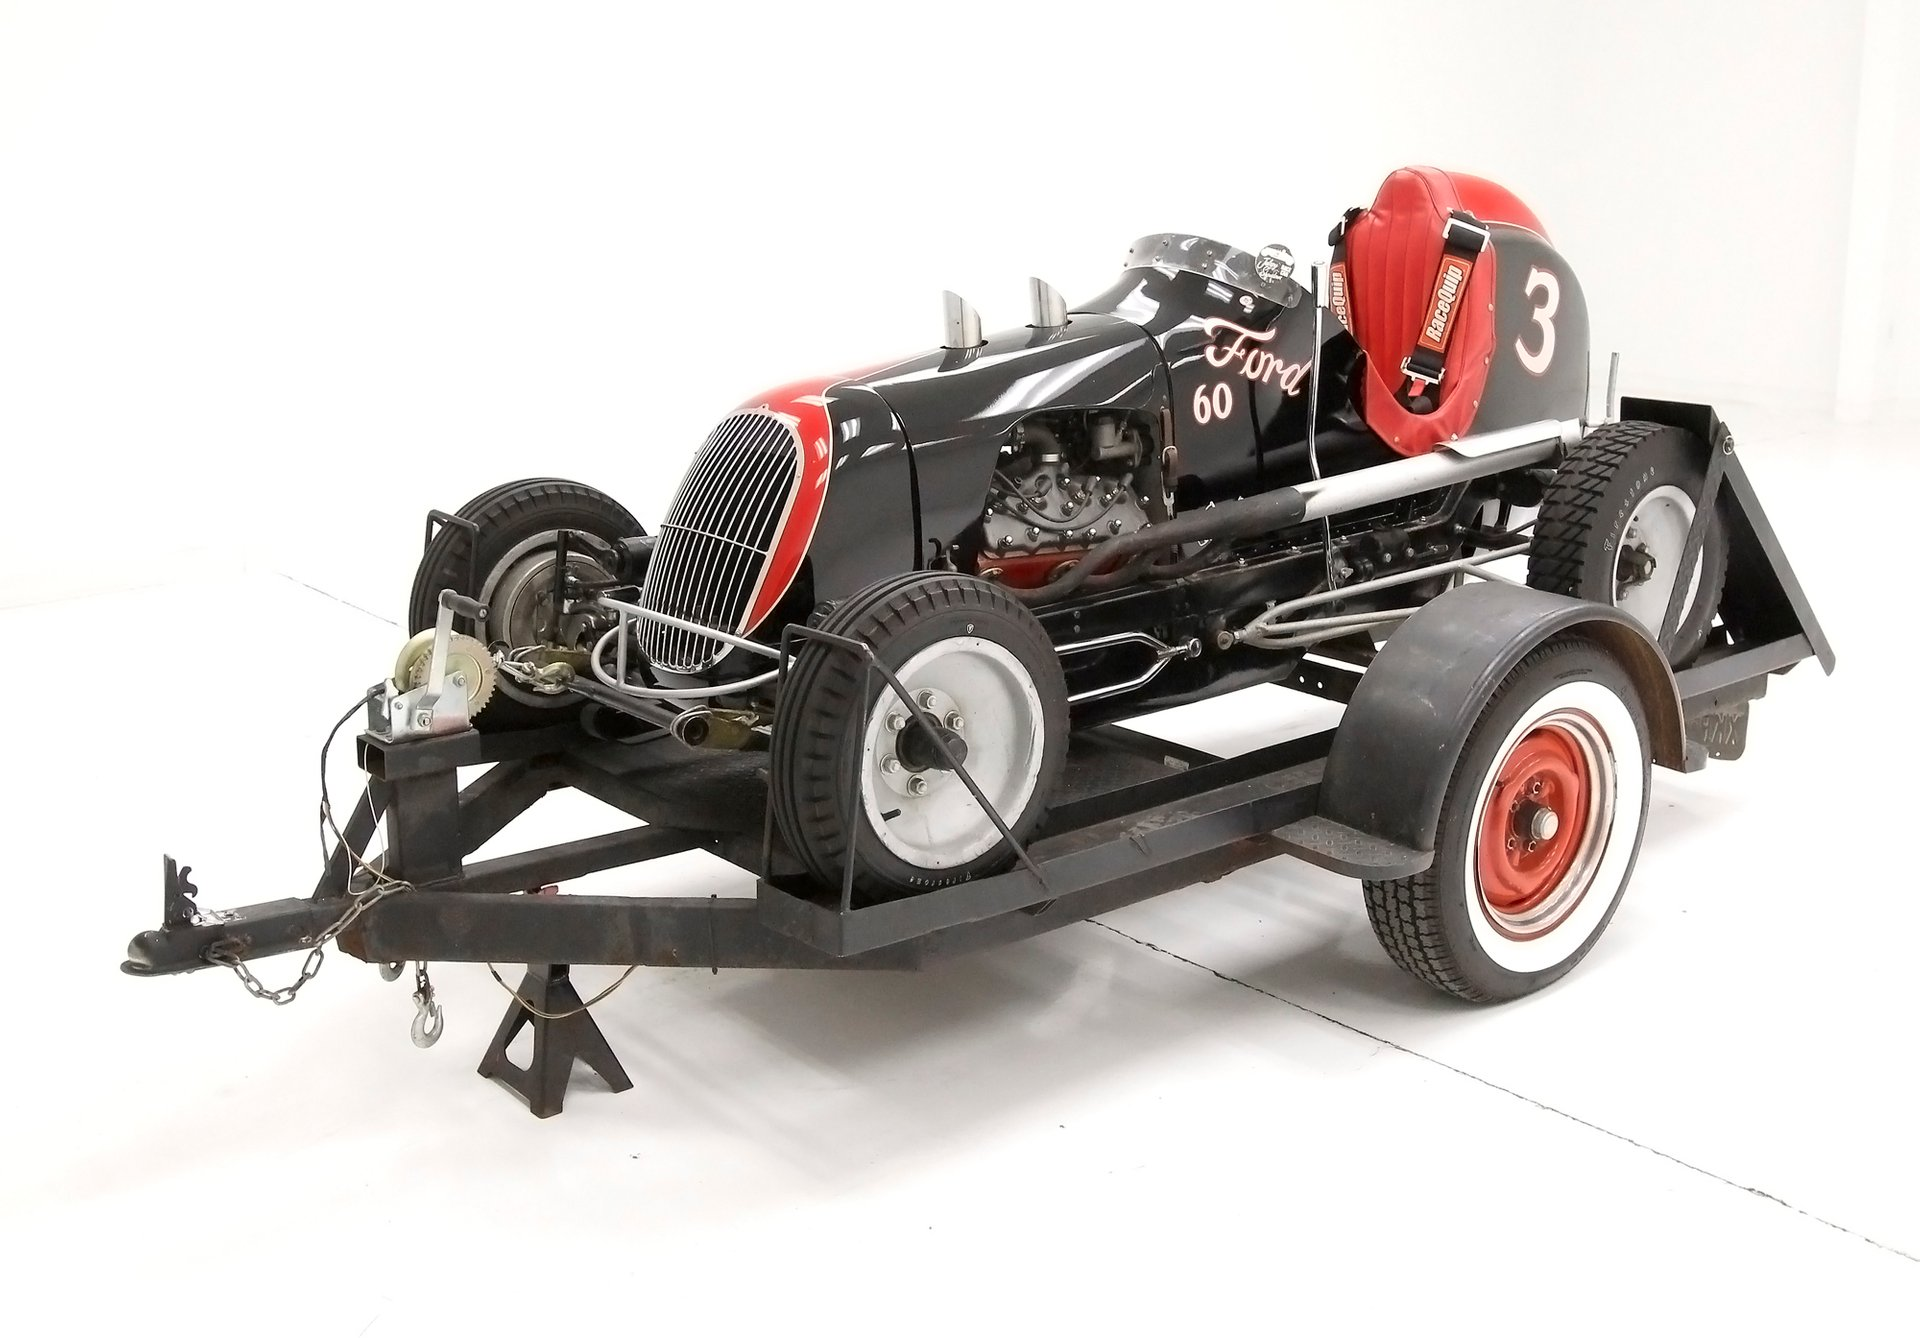 1946 Hillagas Midget Race Car for sale #112342   MCG